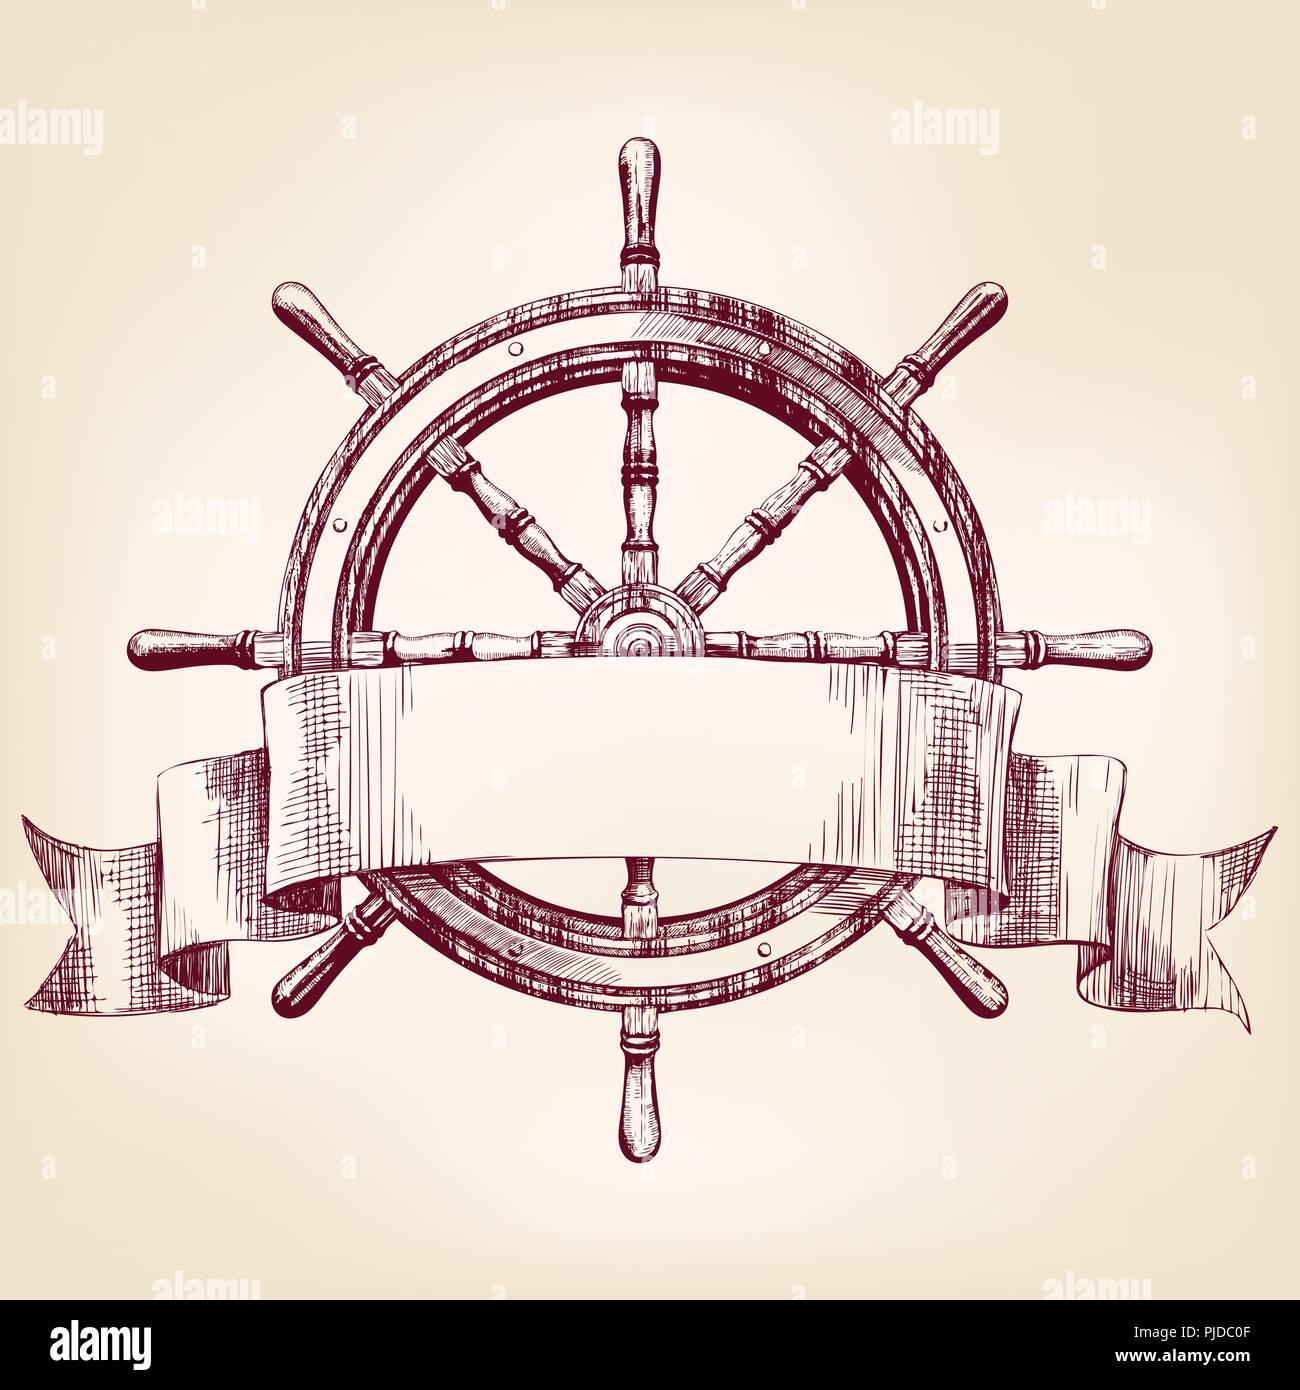 Ship Steering Wheel Drawing Vector Illustration Stock Vector Image Art Alamy